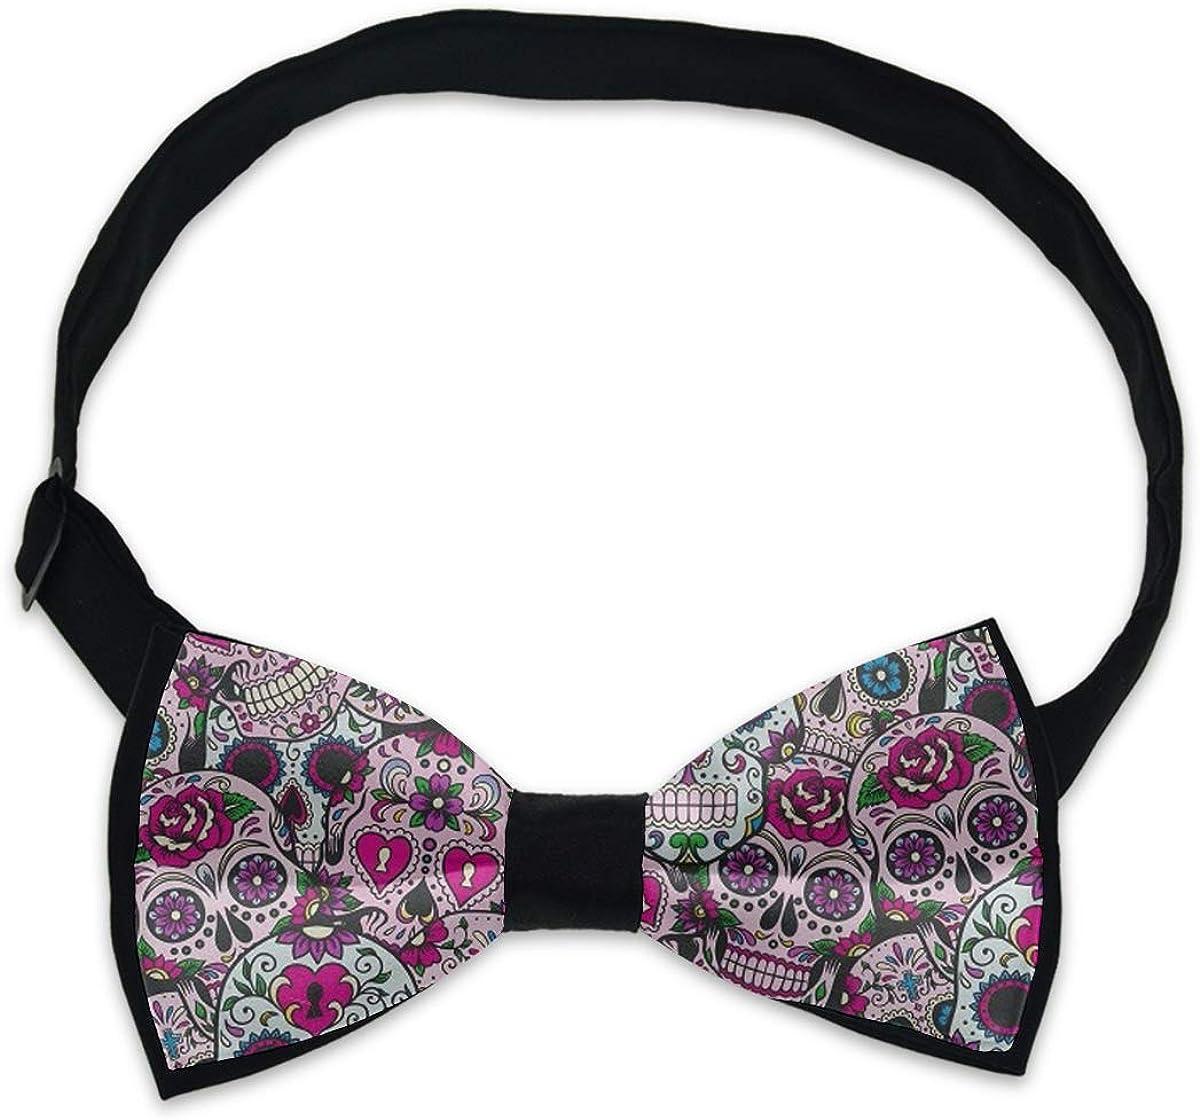 Bowtie, Adjustable Bowties Wedding,Party, Formal Events, Fancy Plain Necktie